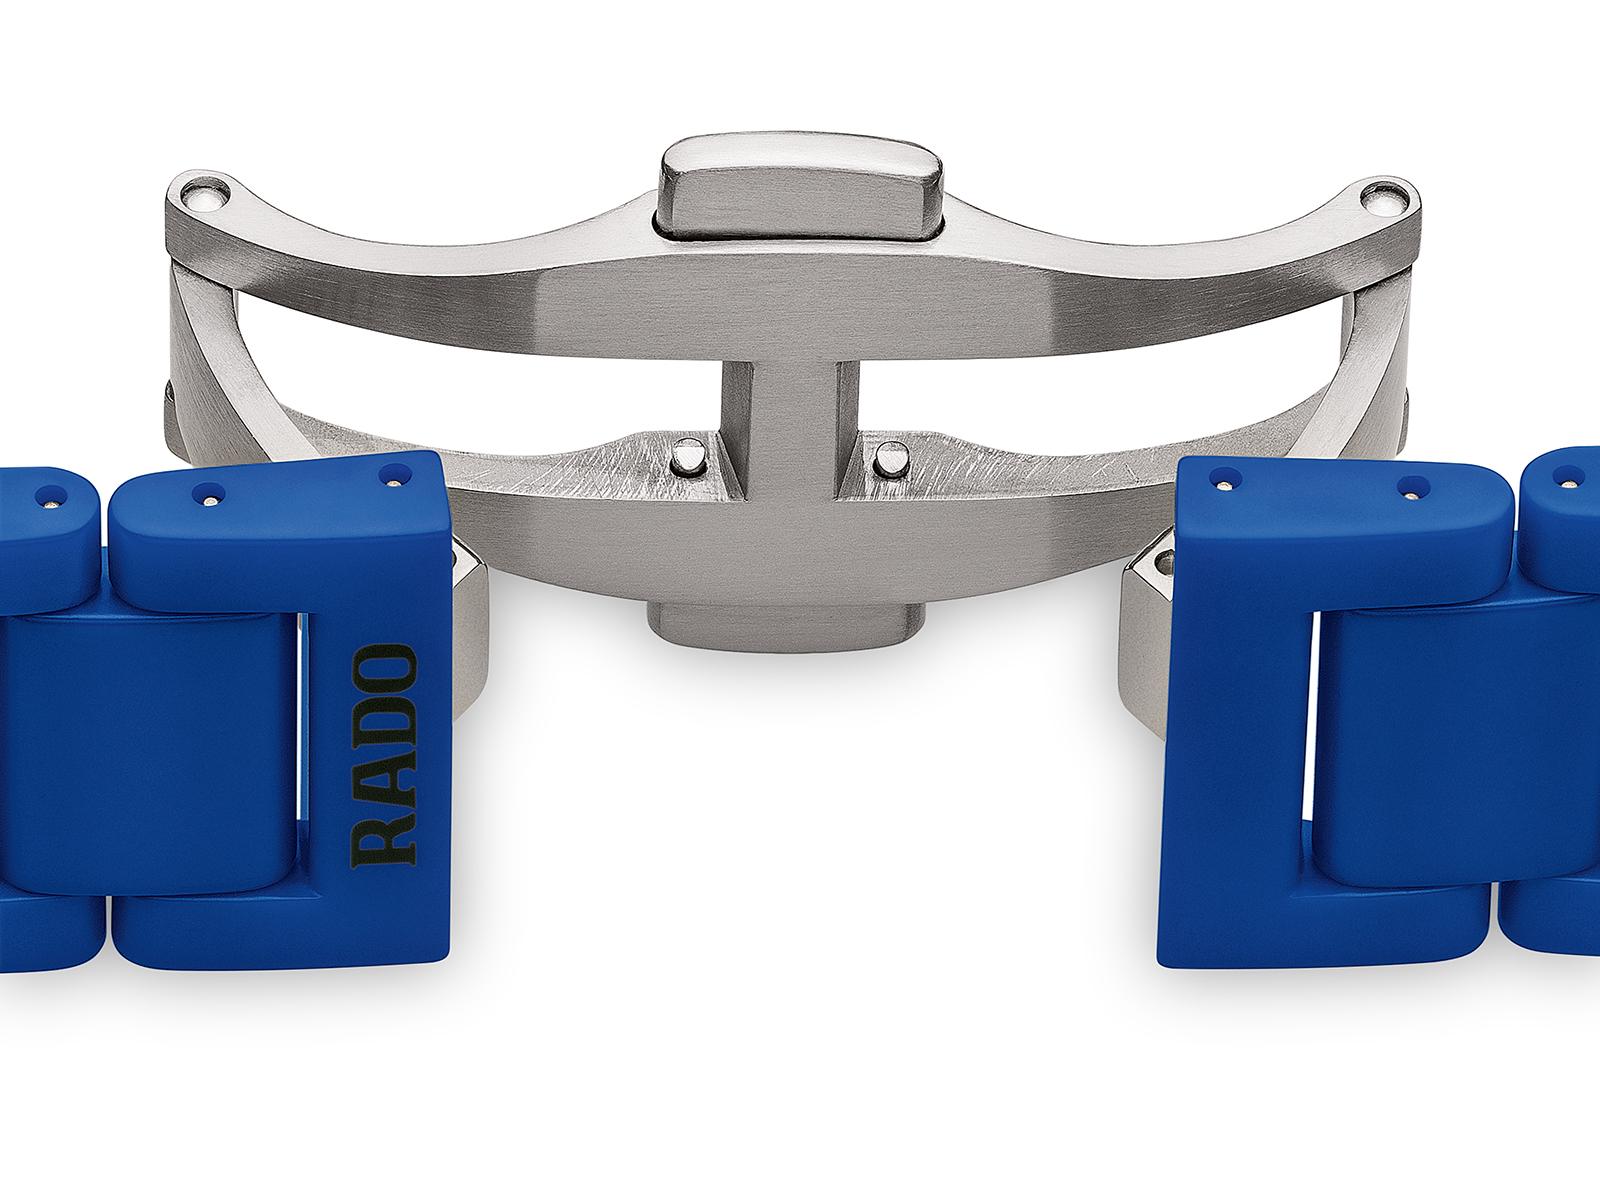 【RADO ラドー】True Thinline Les Couleurs™ Le Corbusier  Spectacula ultramarine 4320K シンライン ル・コルビュジエ(ブルー)/国内正規品 腕時計